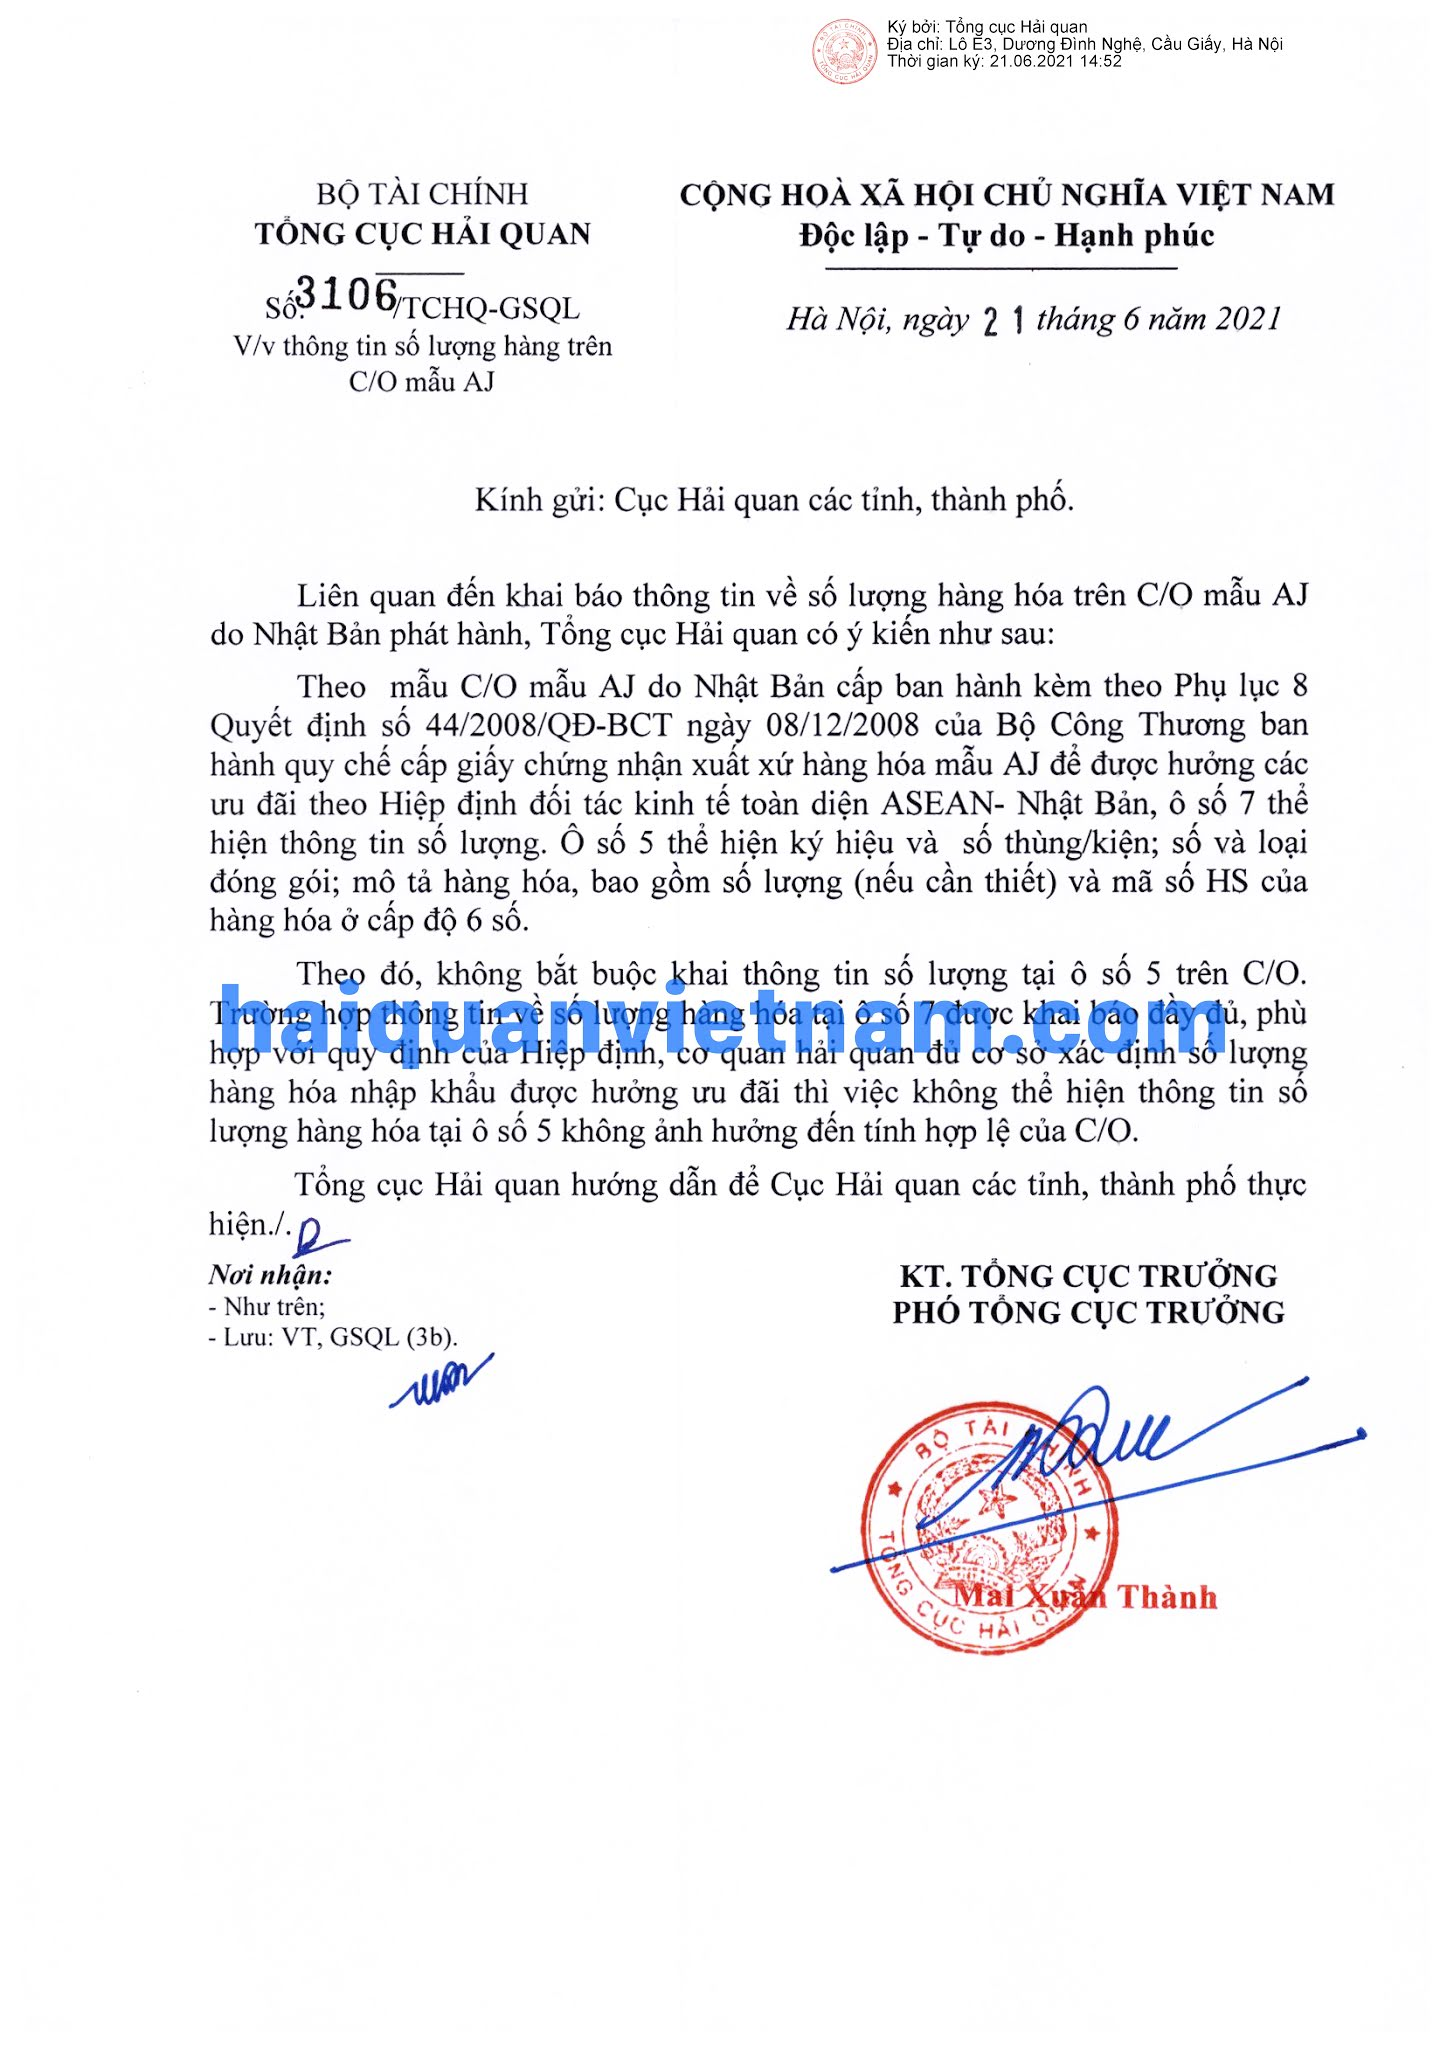 [Image: 210621_3106_TCHQ-GSQL_haiquanvietnam_01.jpg]